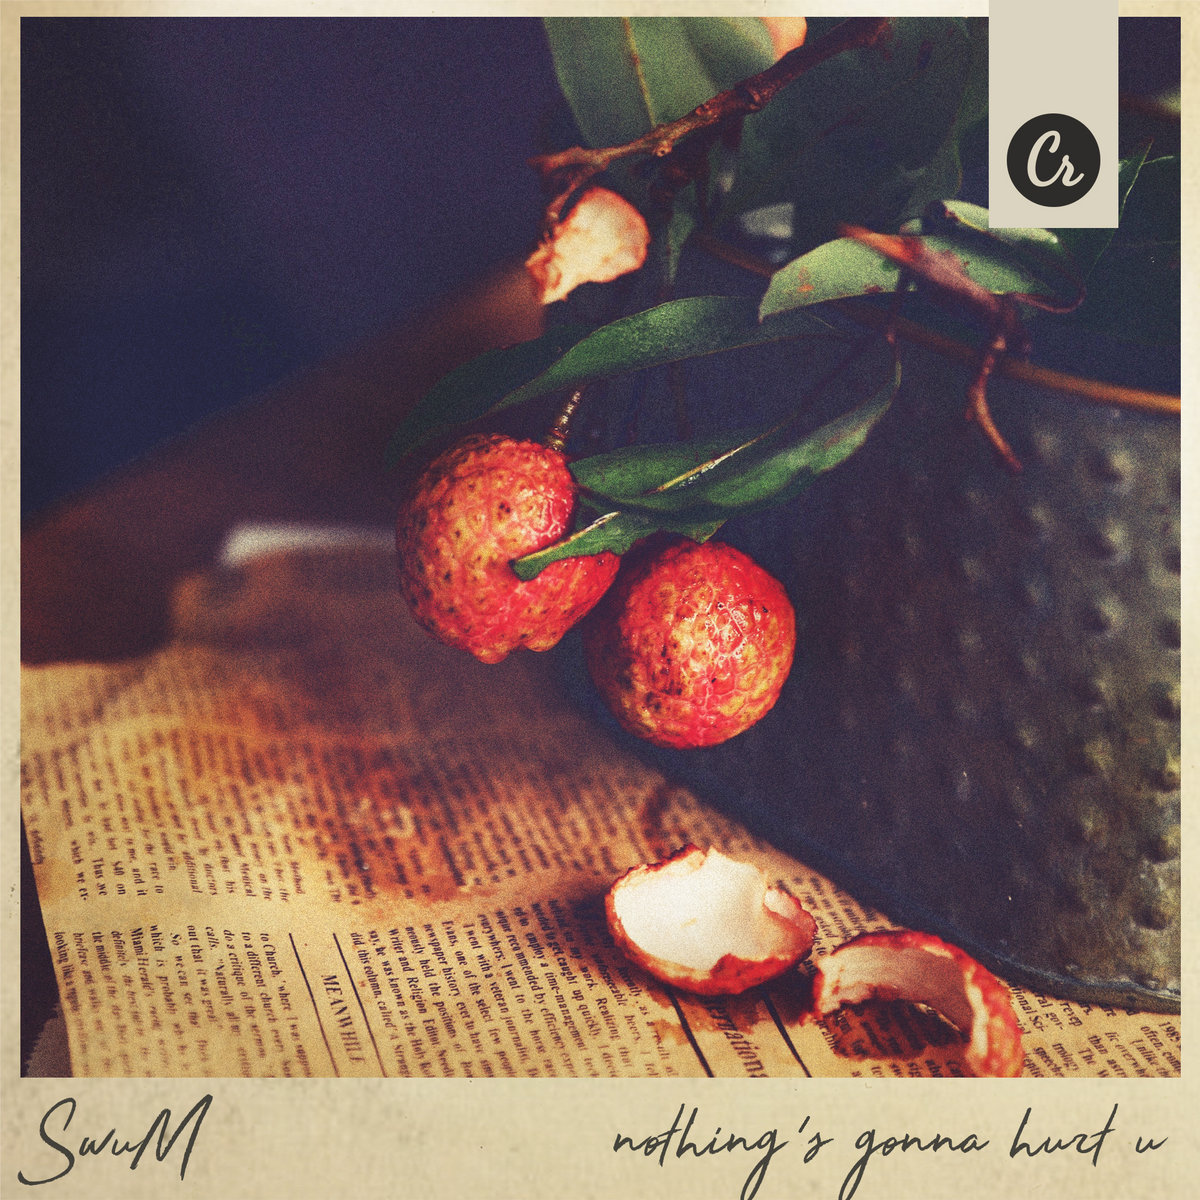 nothing's gonna hurt u by SwuM album art